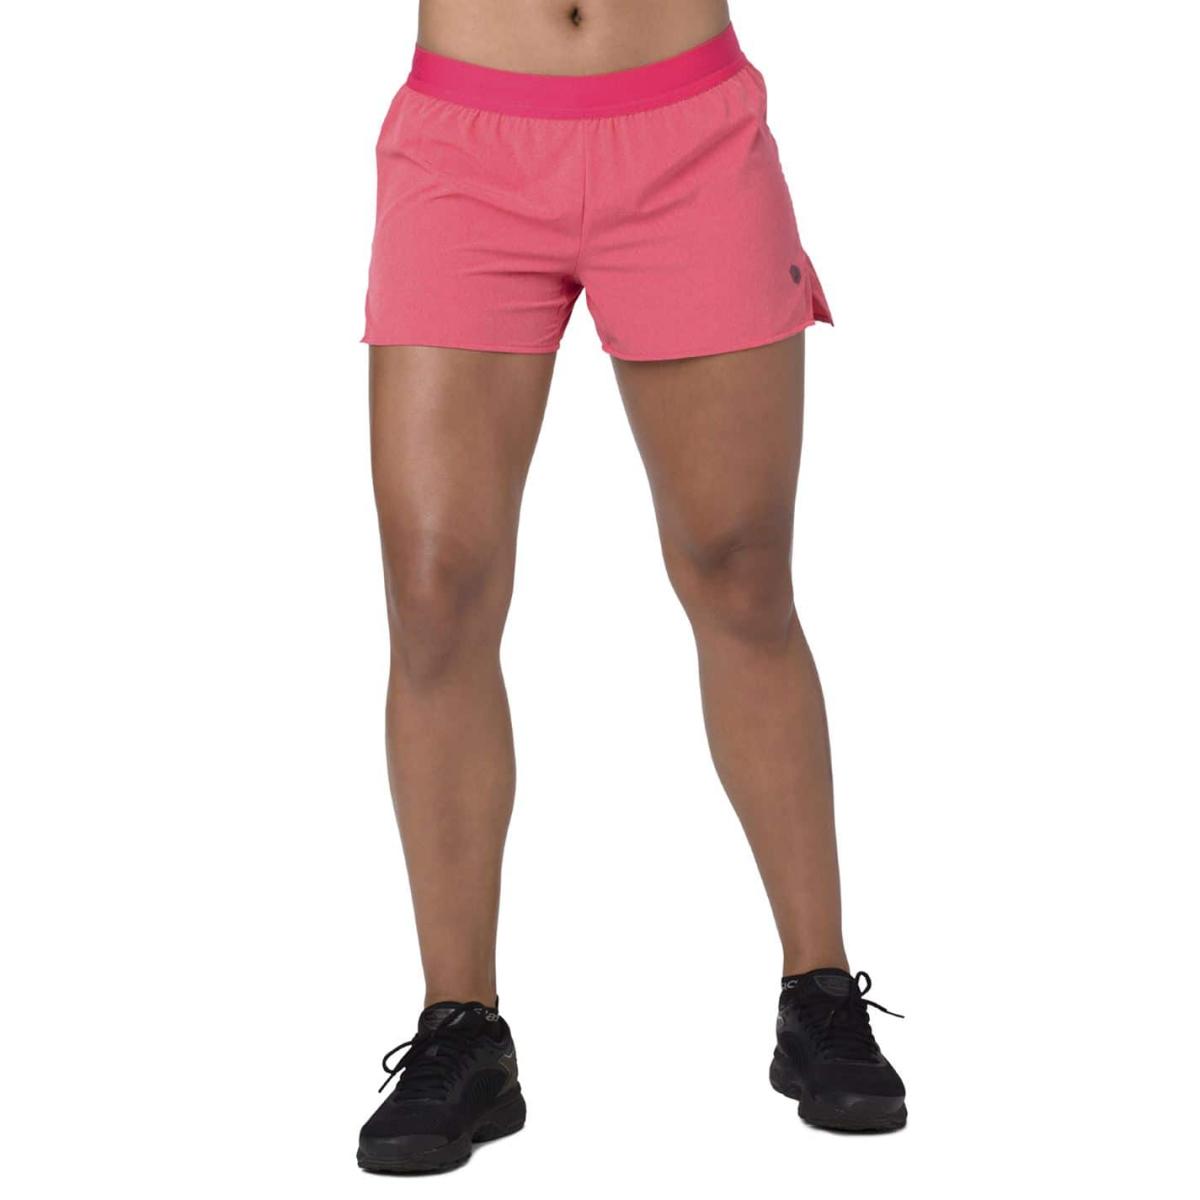 Asics 3.5in Kurzhose Shorts Damen Pink